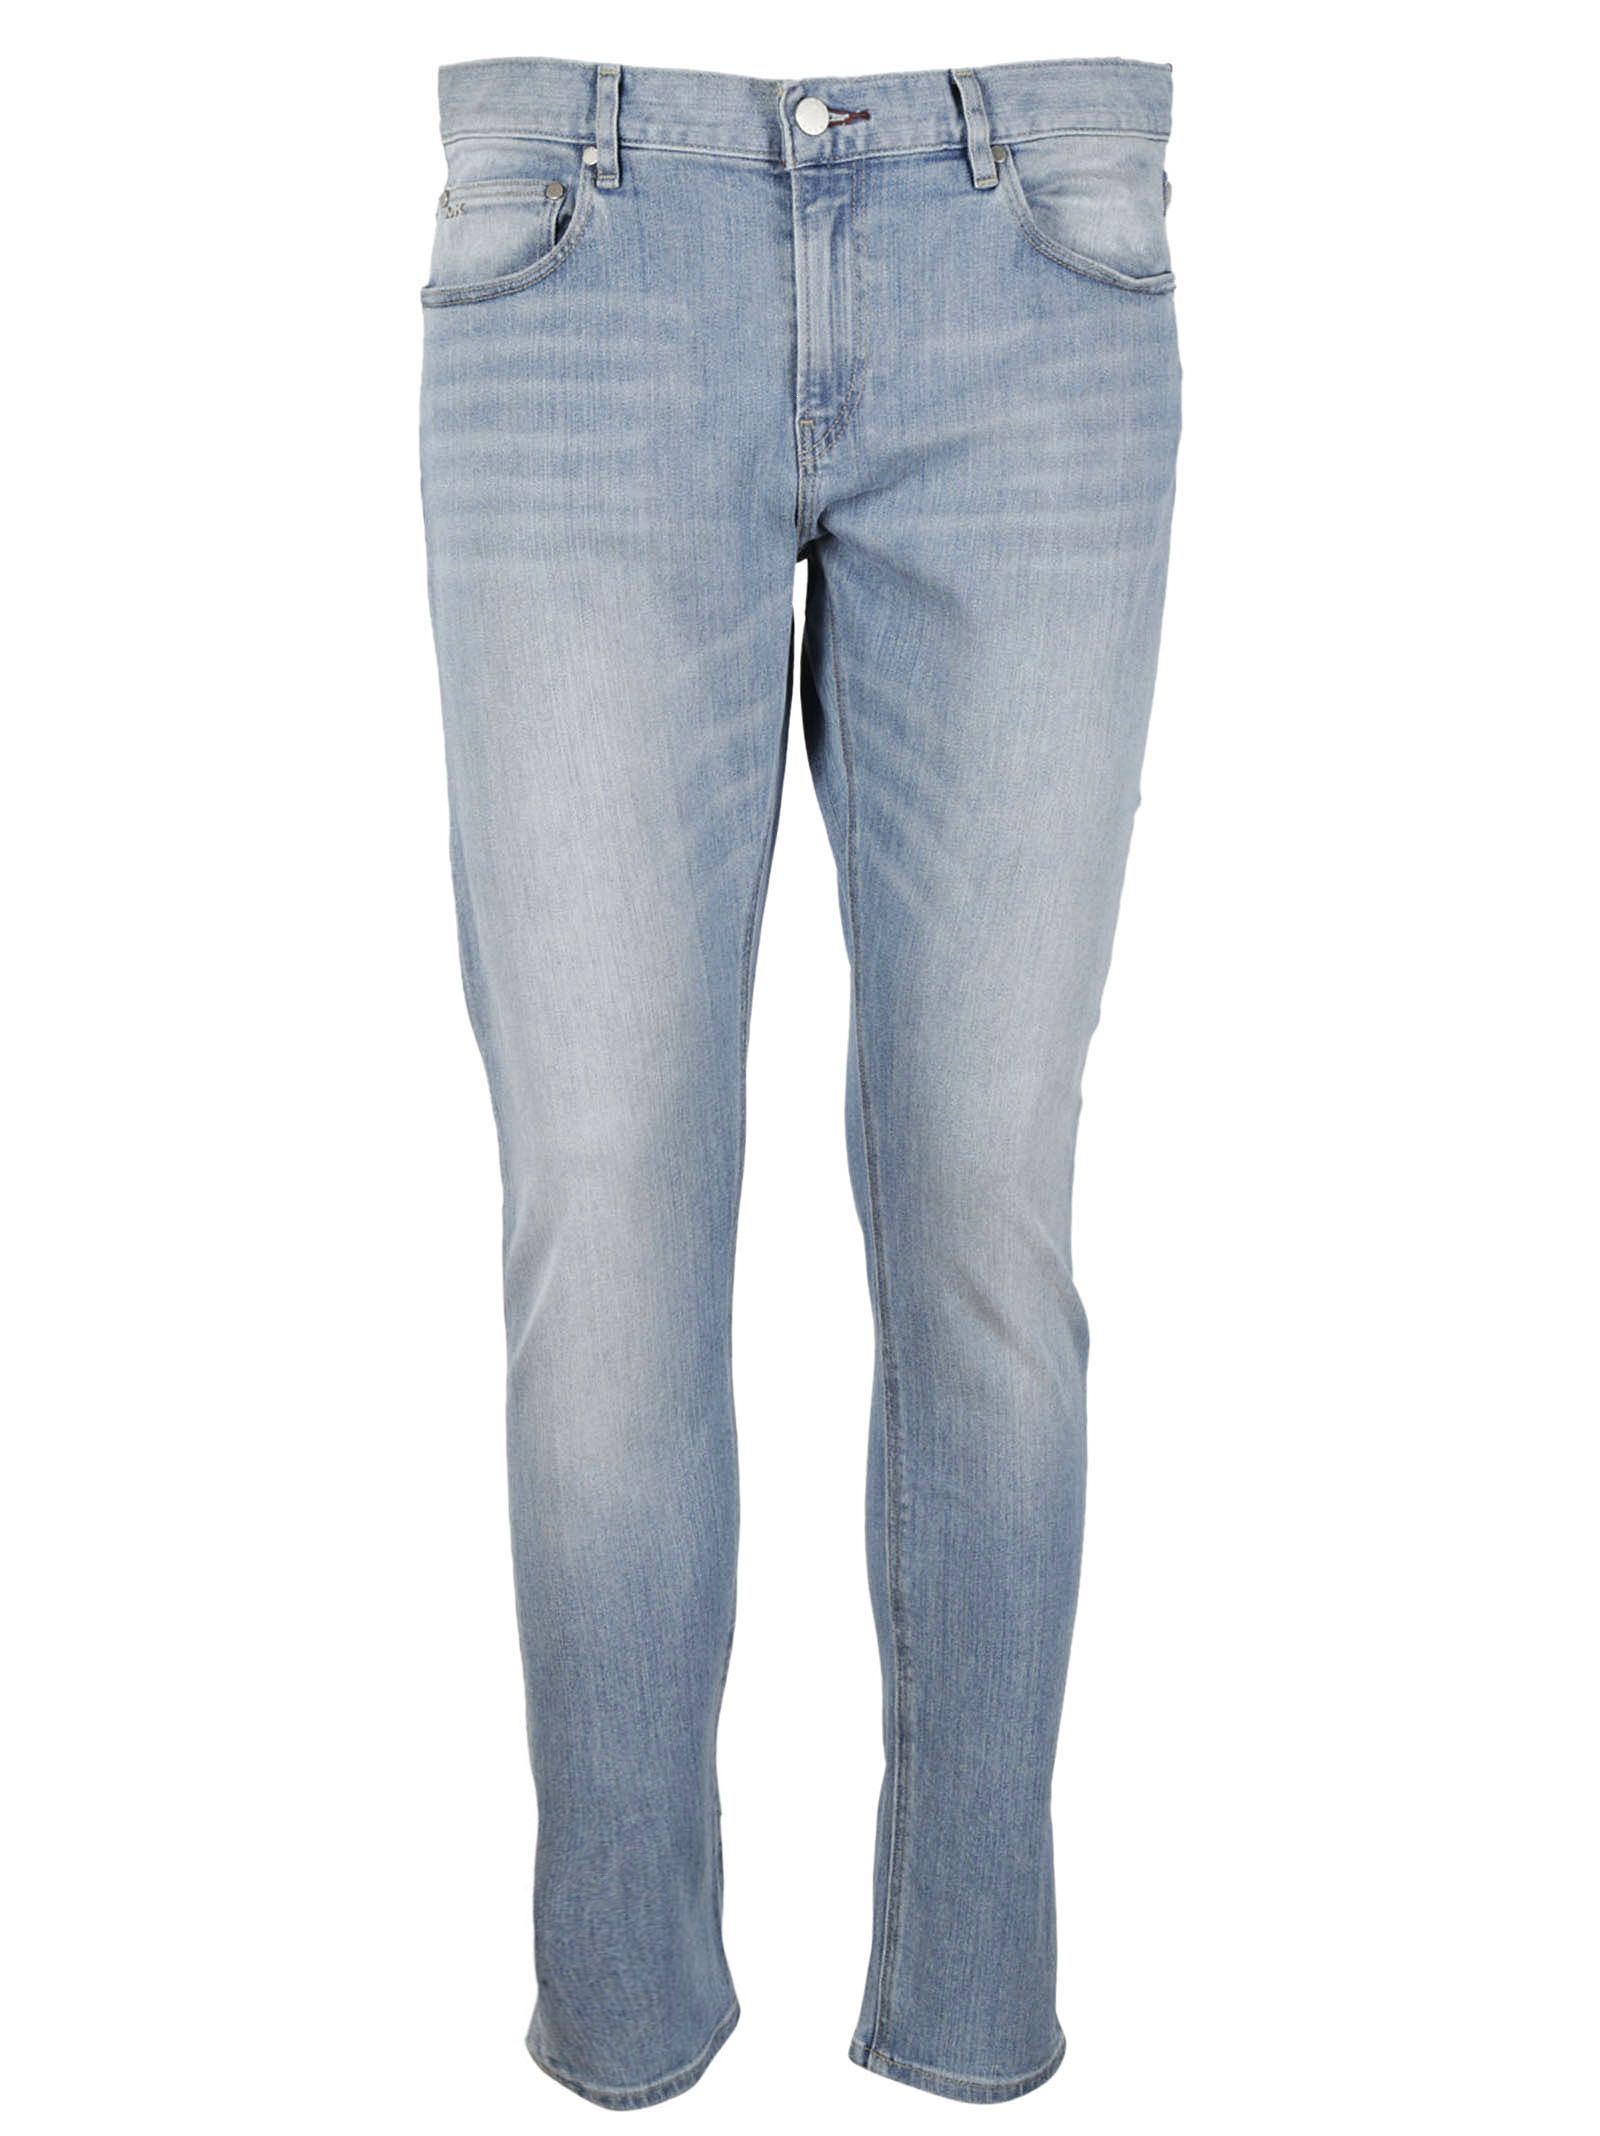 Michael Kors Slim Fit Stretch Jeans